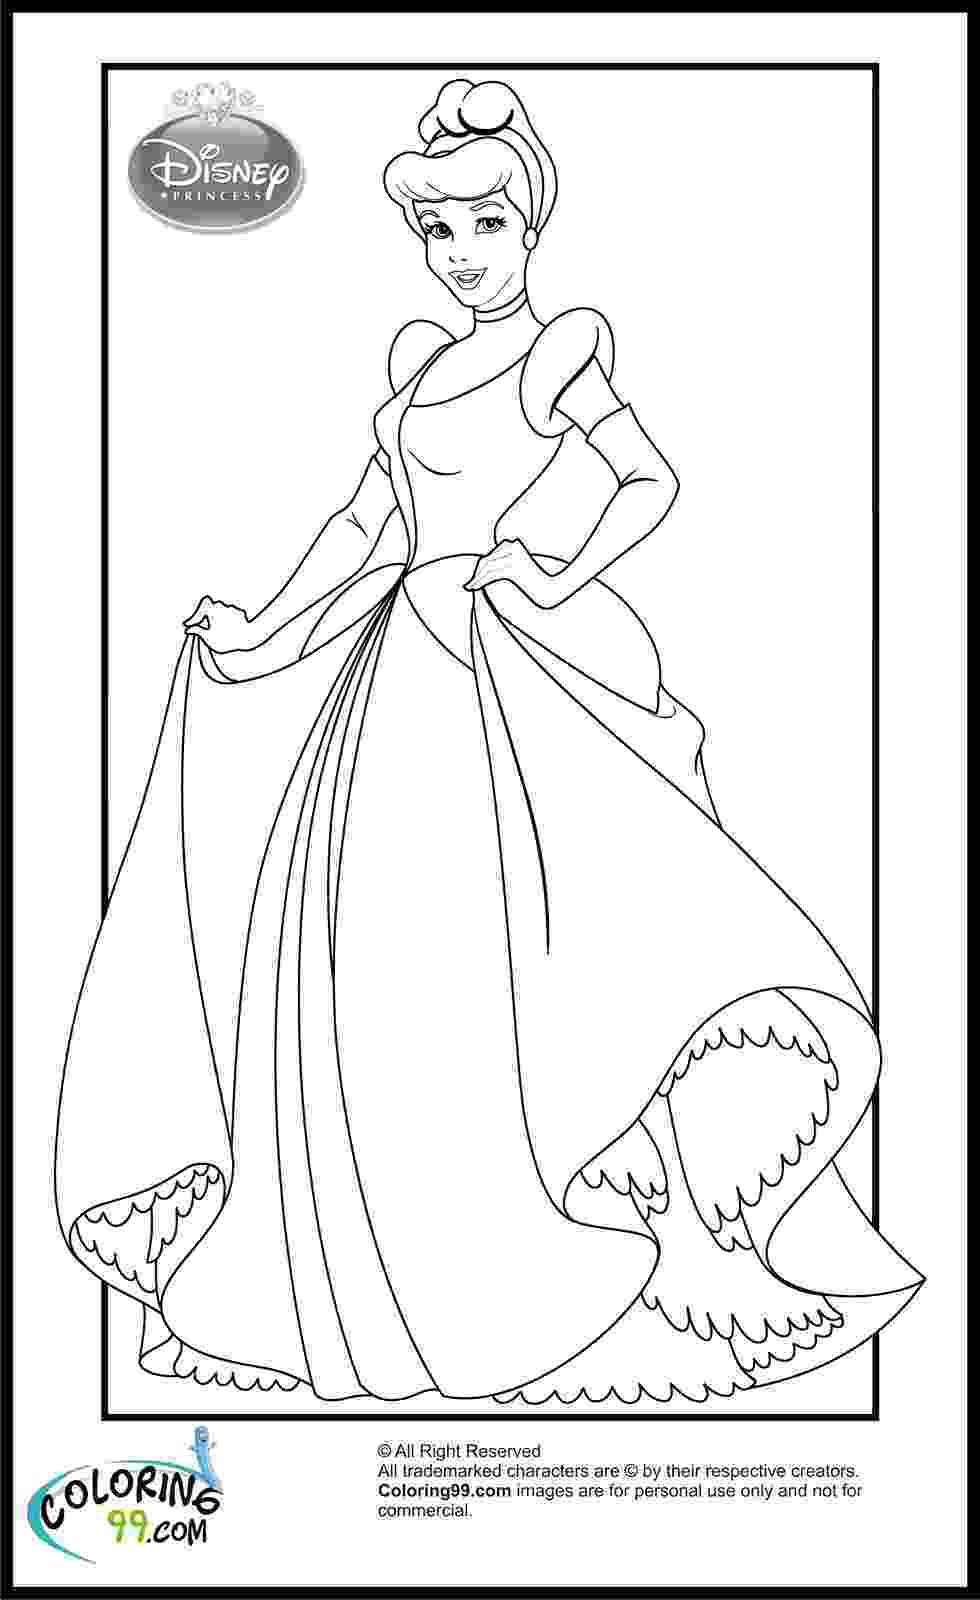 cinderella coloring pages free princess cinderella coloring pages ideas pages cinderella free coloring